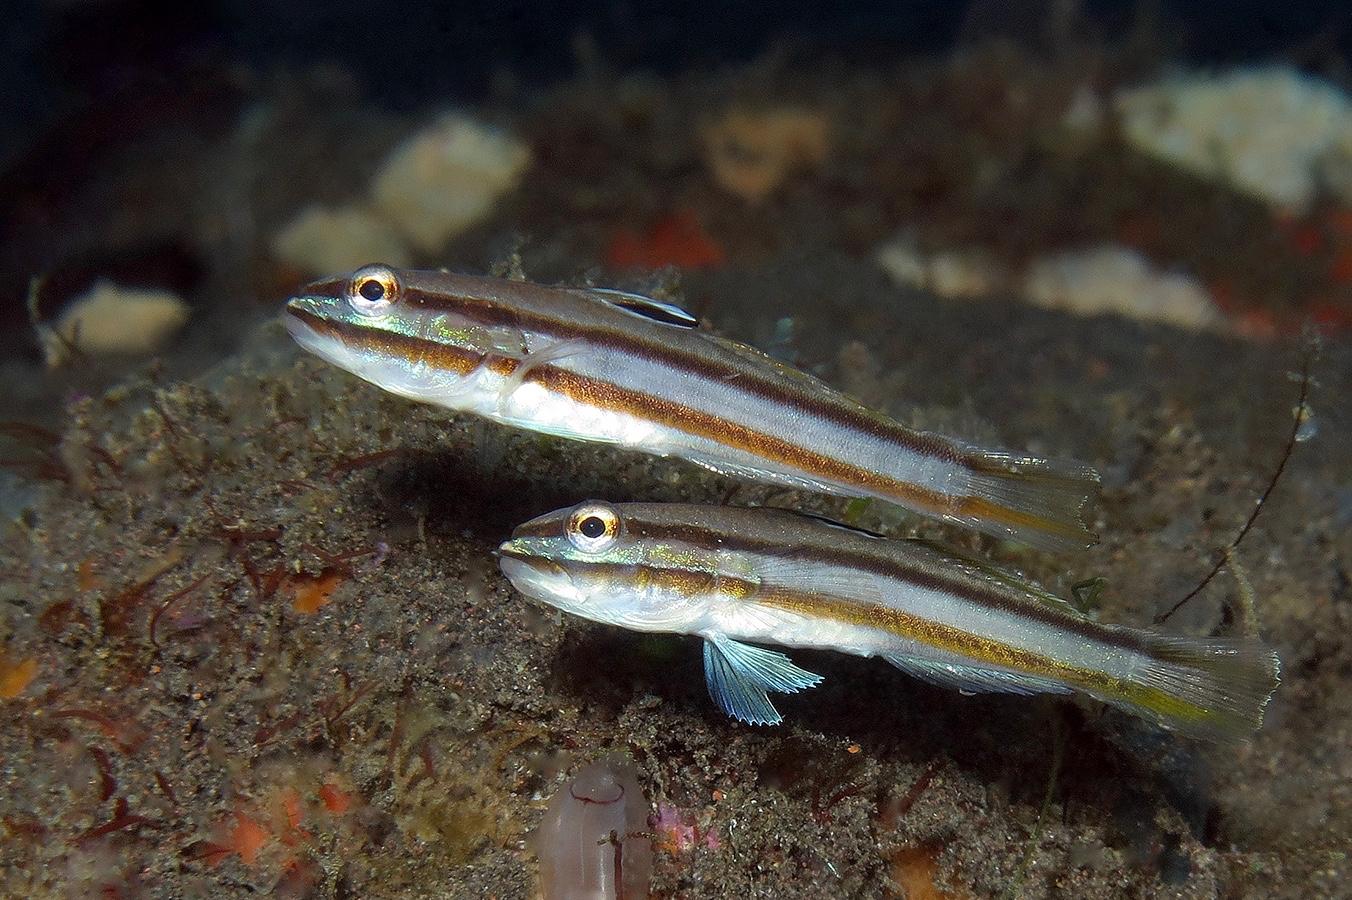 Valenciennea helsdingenii     巴厘岛图蓝本 Tulamben 印度尼西亚 Indonesia @lazydiving.com 潜水时光